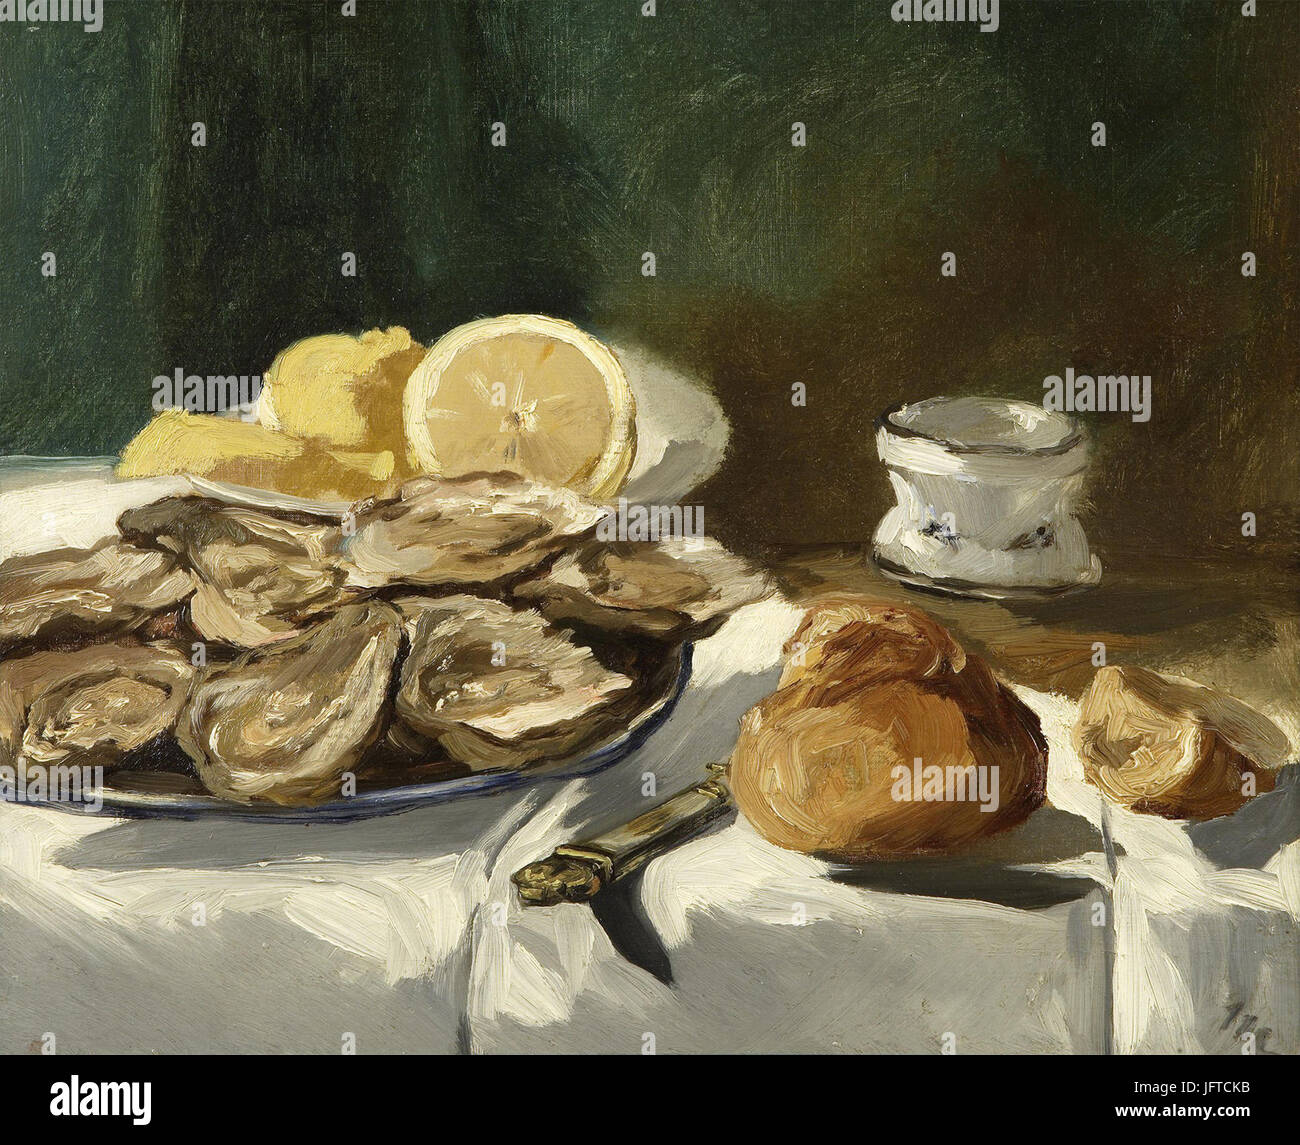 Édouard Manet - Nature morte, huơAEtres, citron, brioche (RW 252) - Stock Image